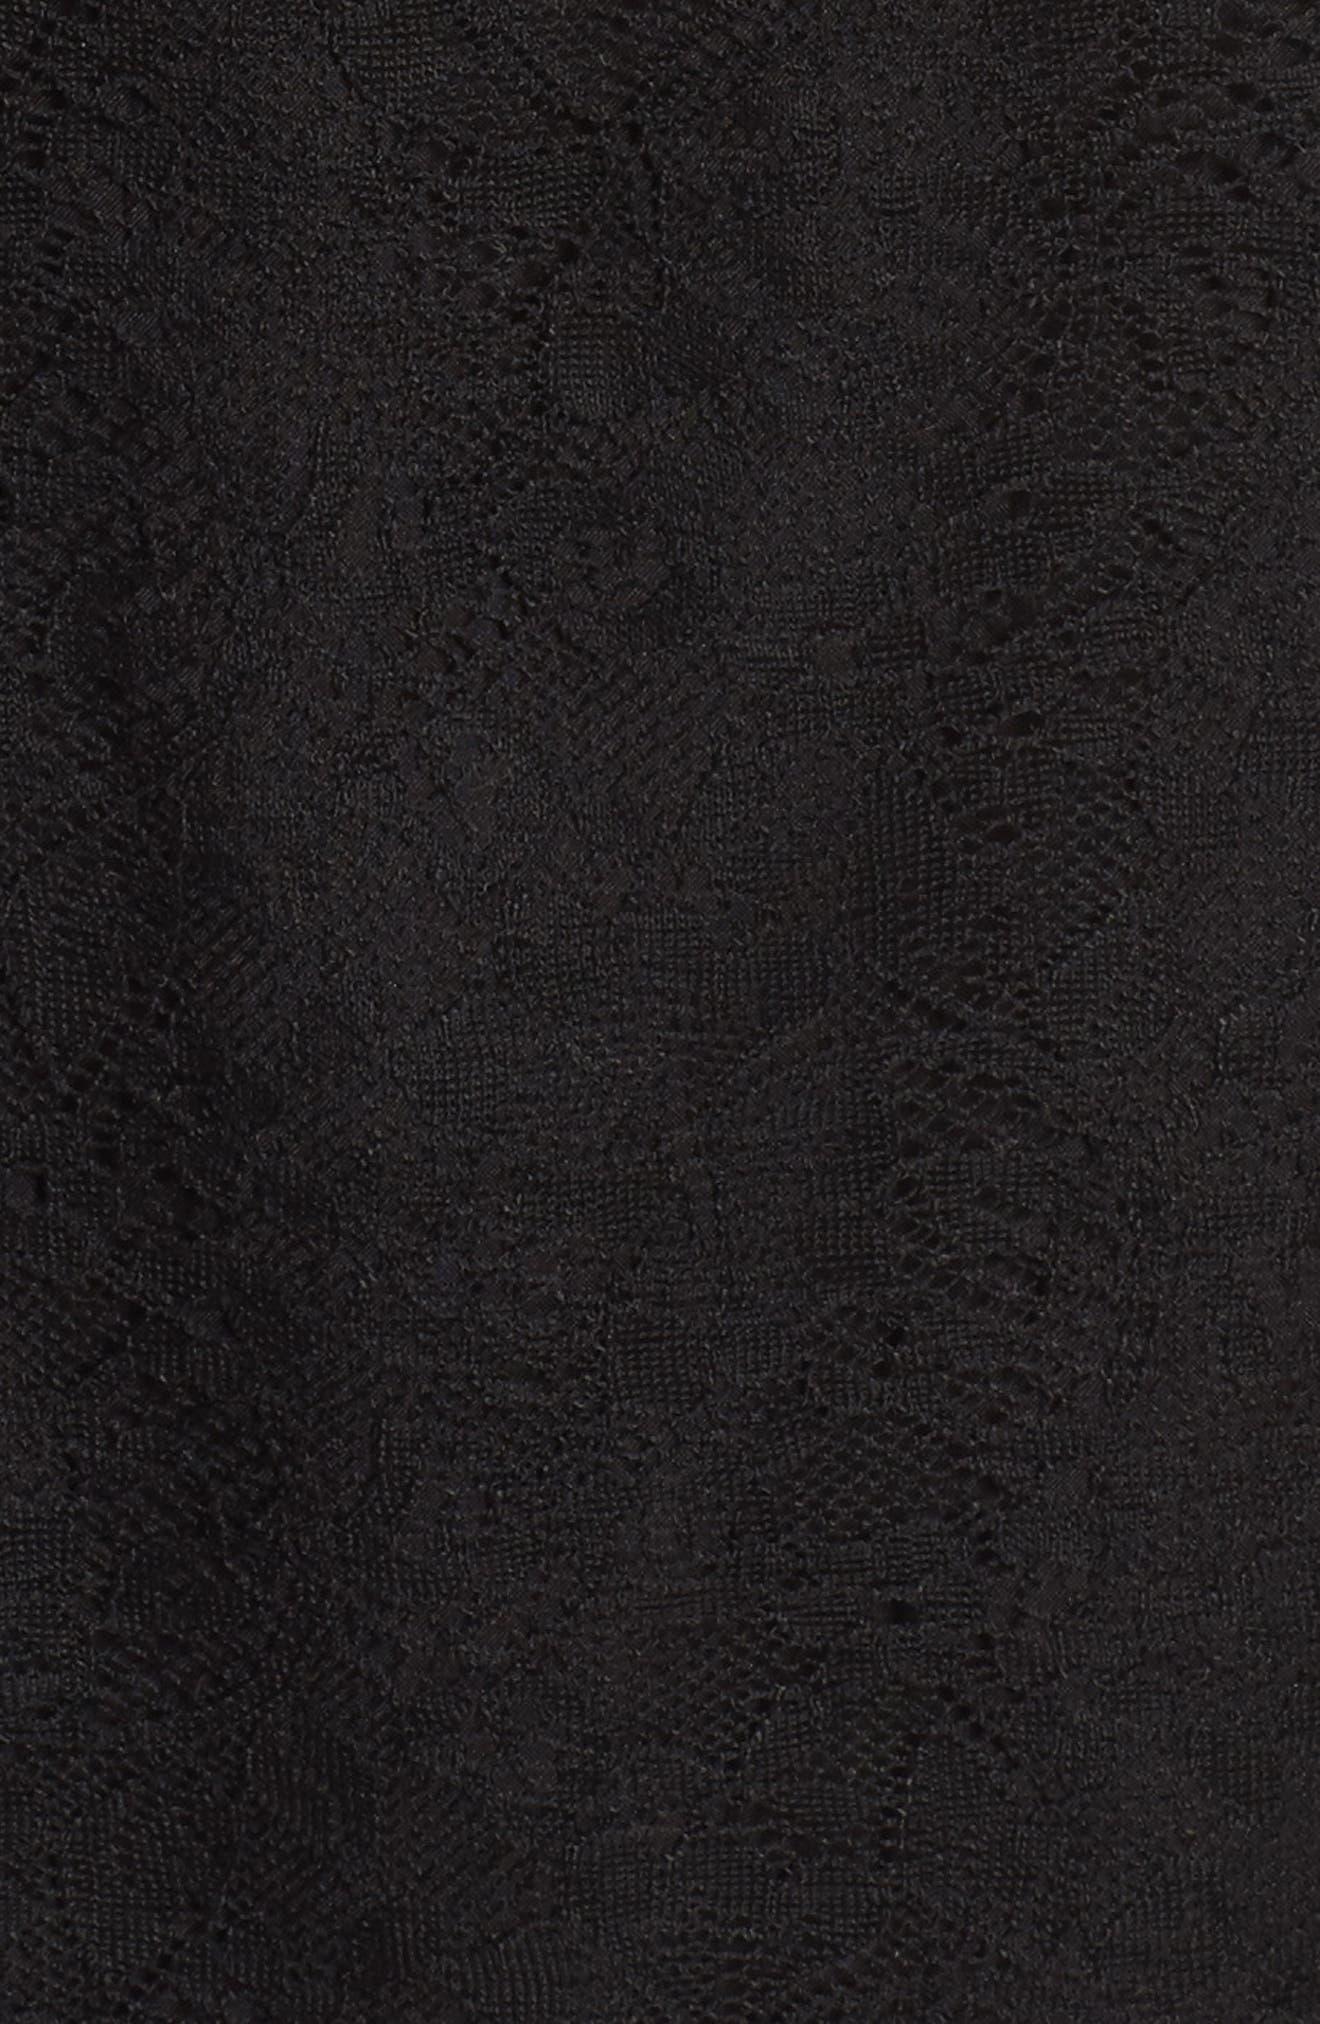 Ruffle Lace Top,                             Alternate thumbnail 5, color,